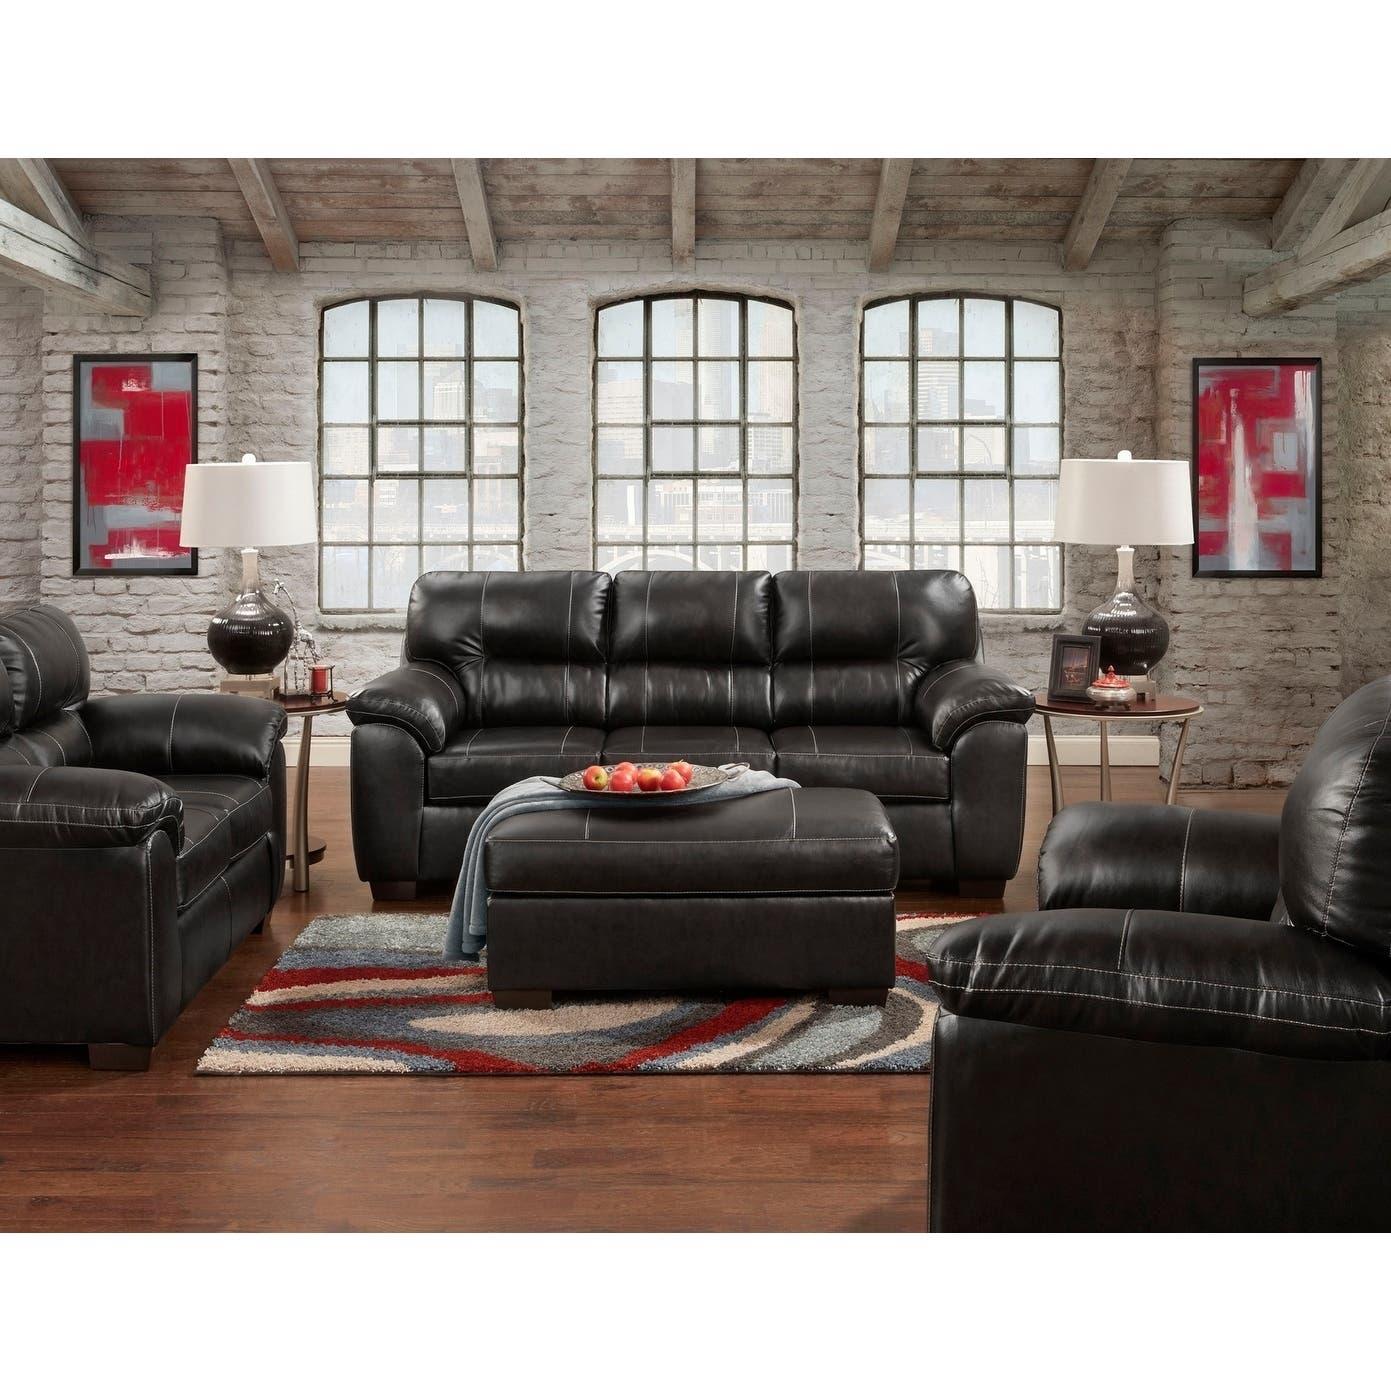 Great Deals On Furniture Online: Buy Ottomans & Storage Ottomans Online At Overstock